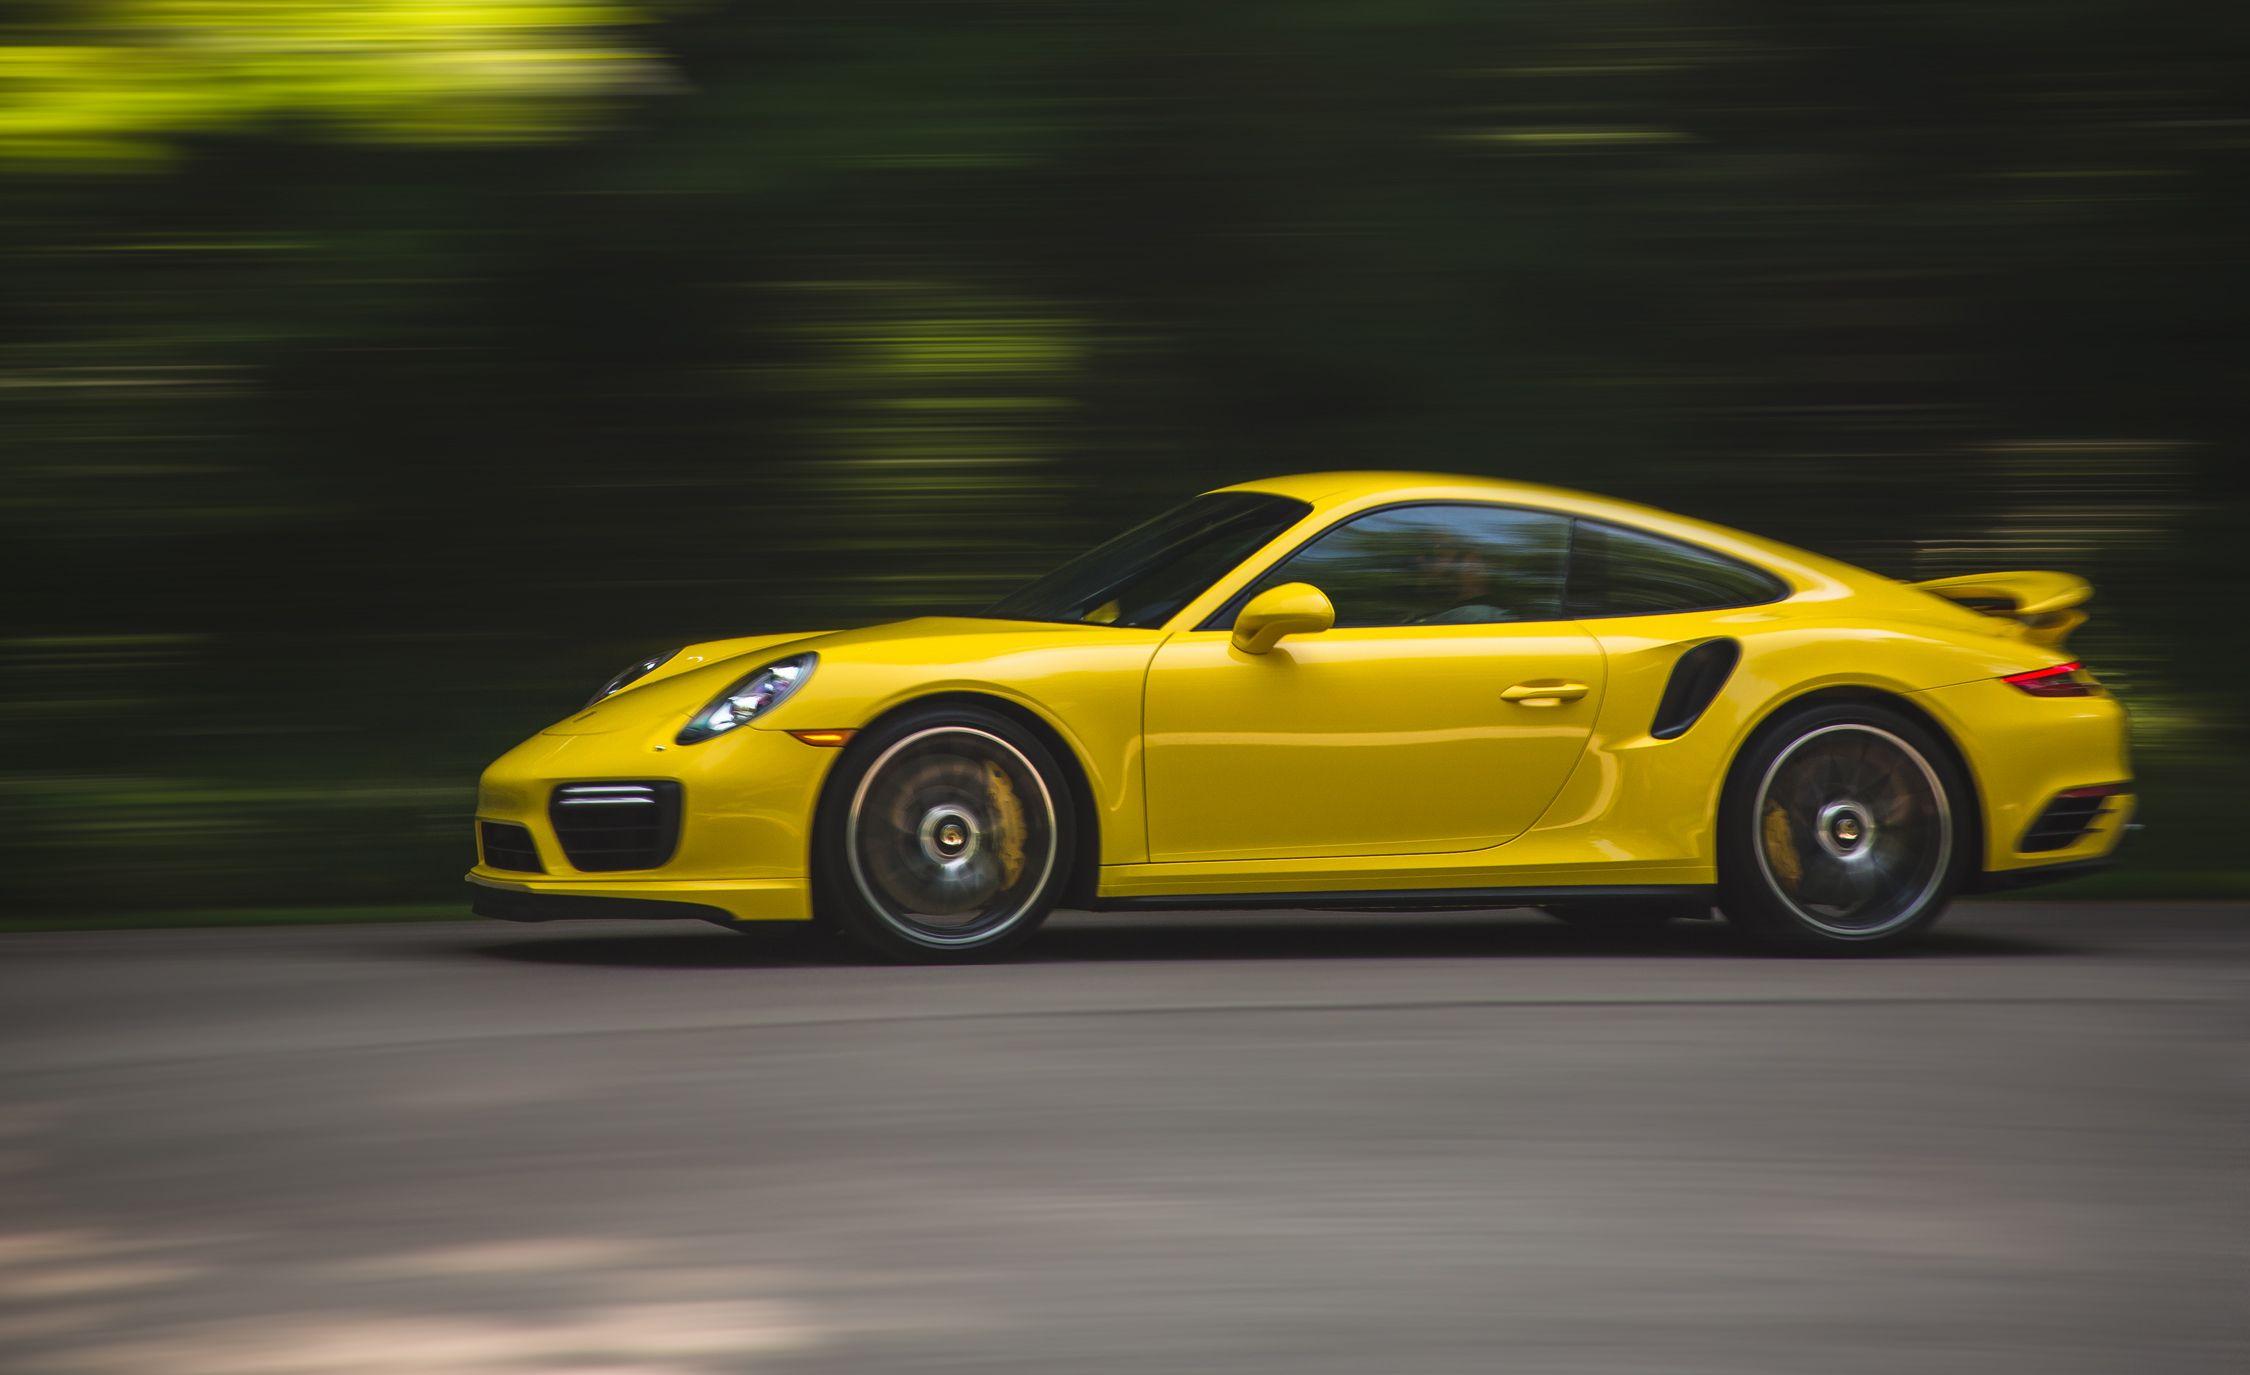 2019 Porsche 911 Turbo / Turbo S